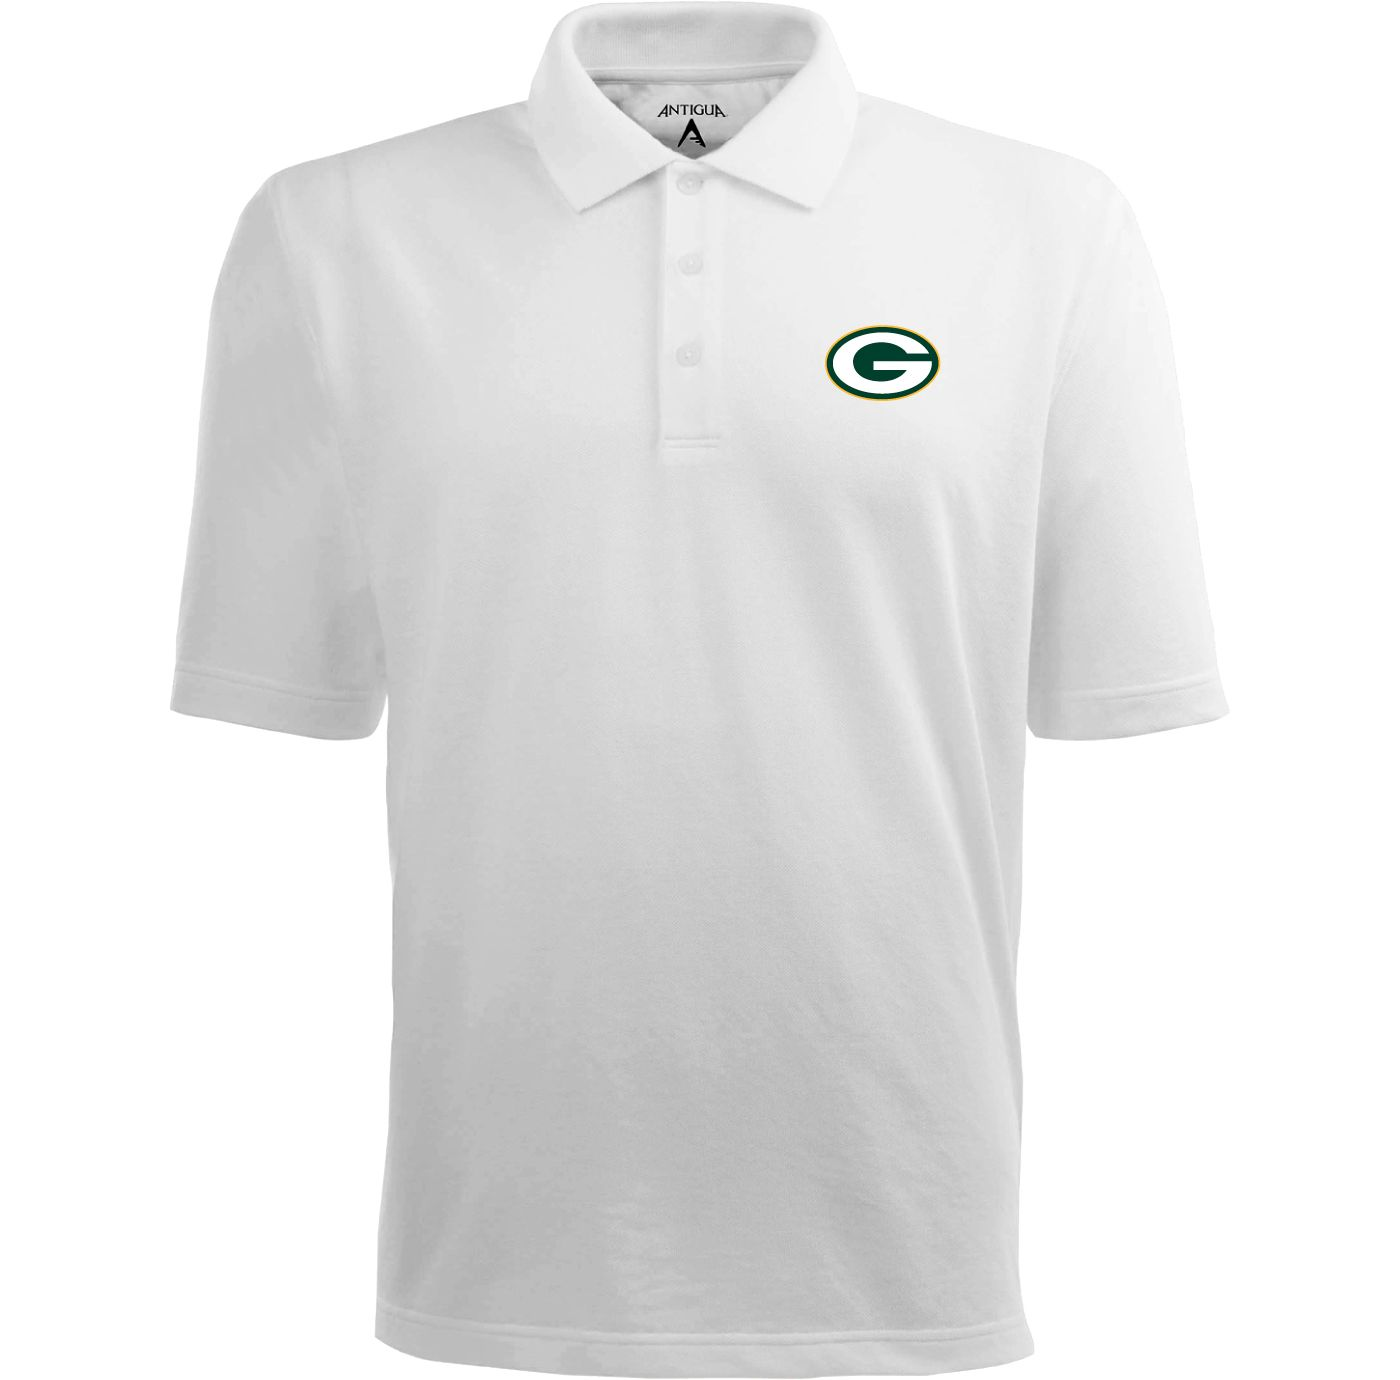 Antigua Men's Green Bay Packers Pique Xtra-Lite White Polo